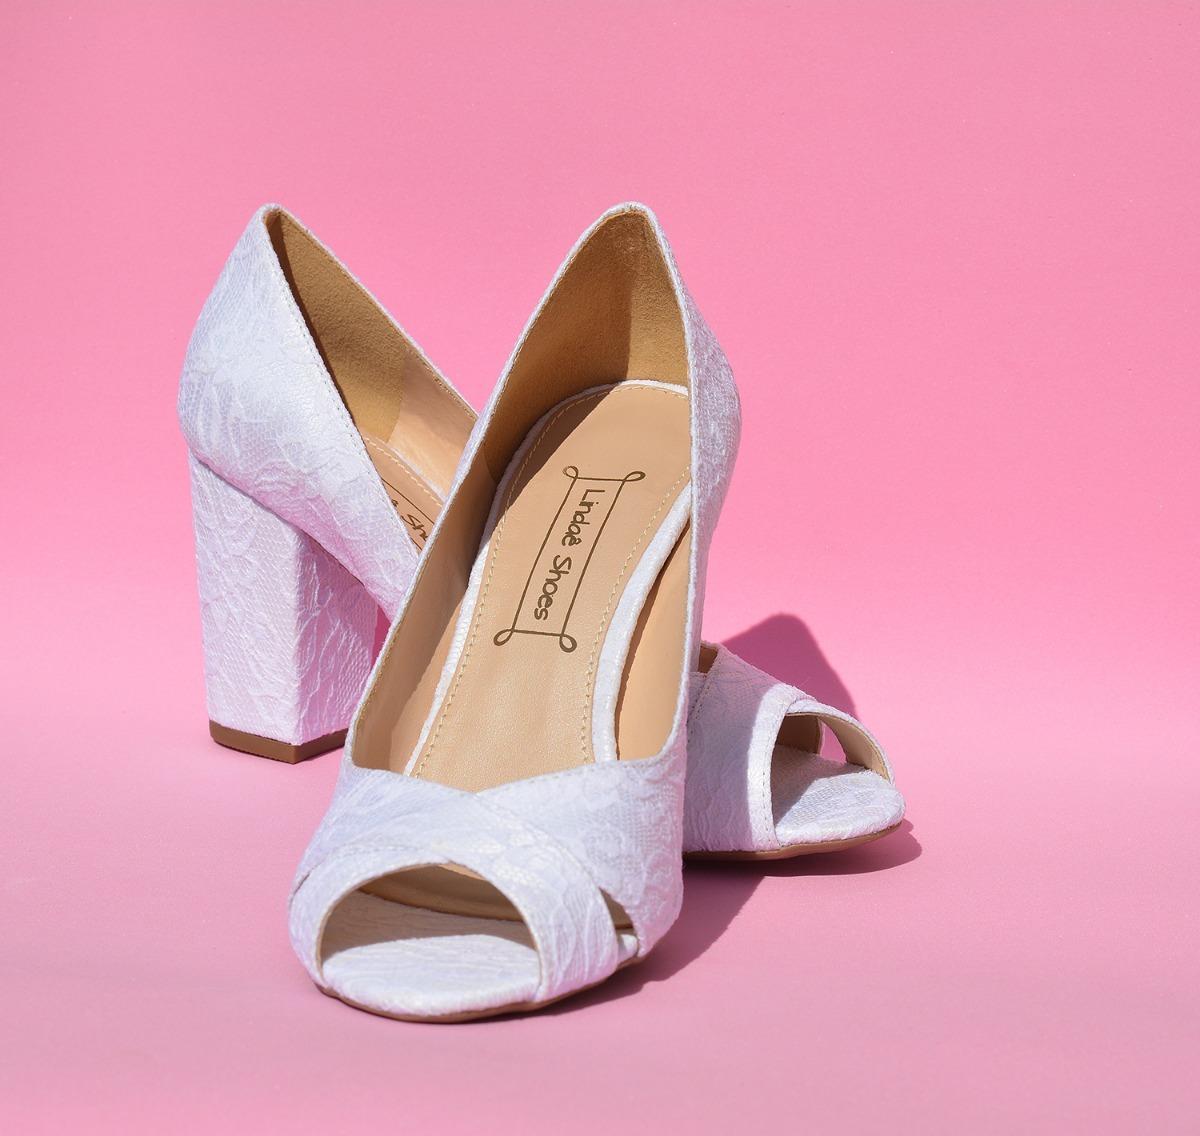 d5039c851 sapato, sandália branca, tecido renda para noivas salto 8 cm. Carregando  zoom.